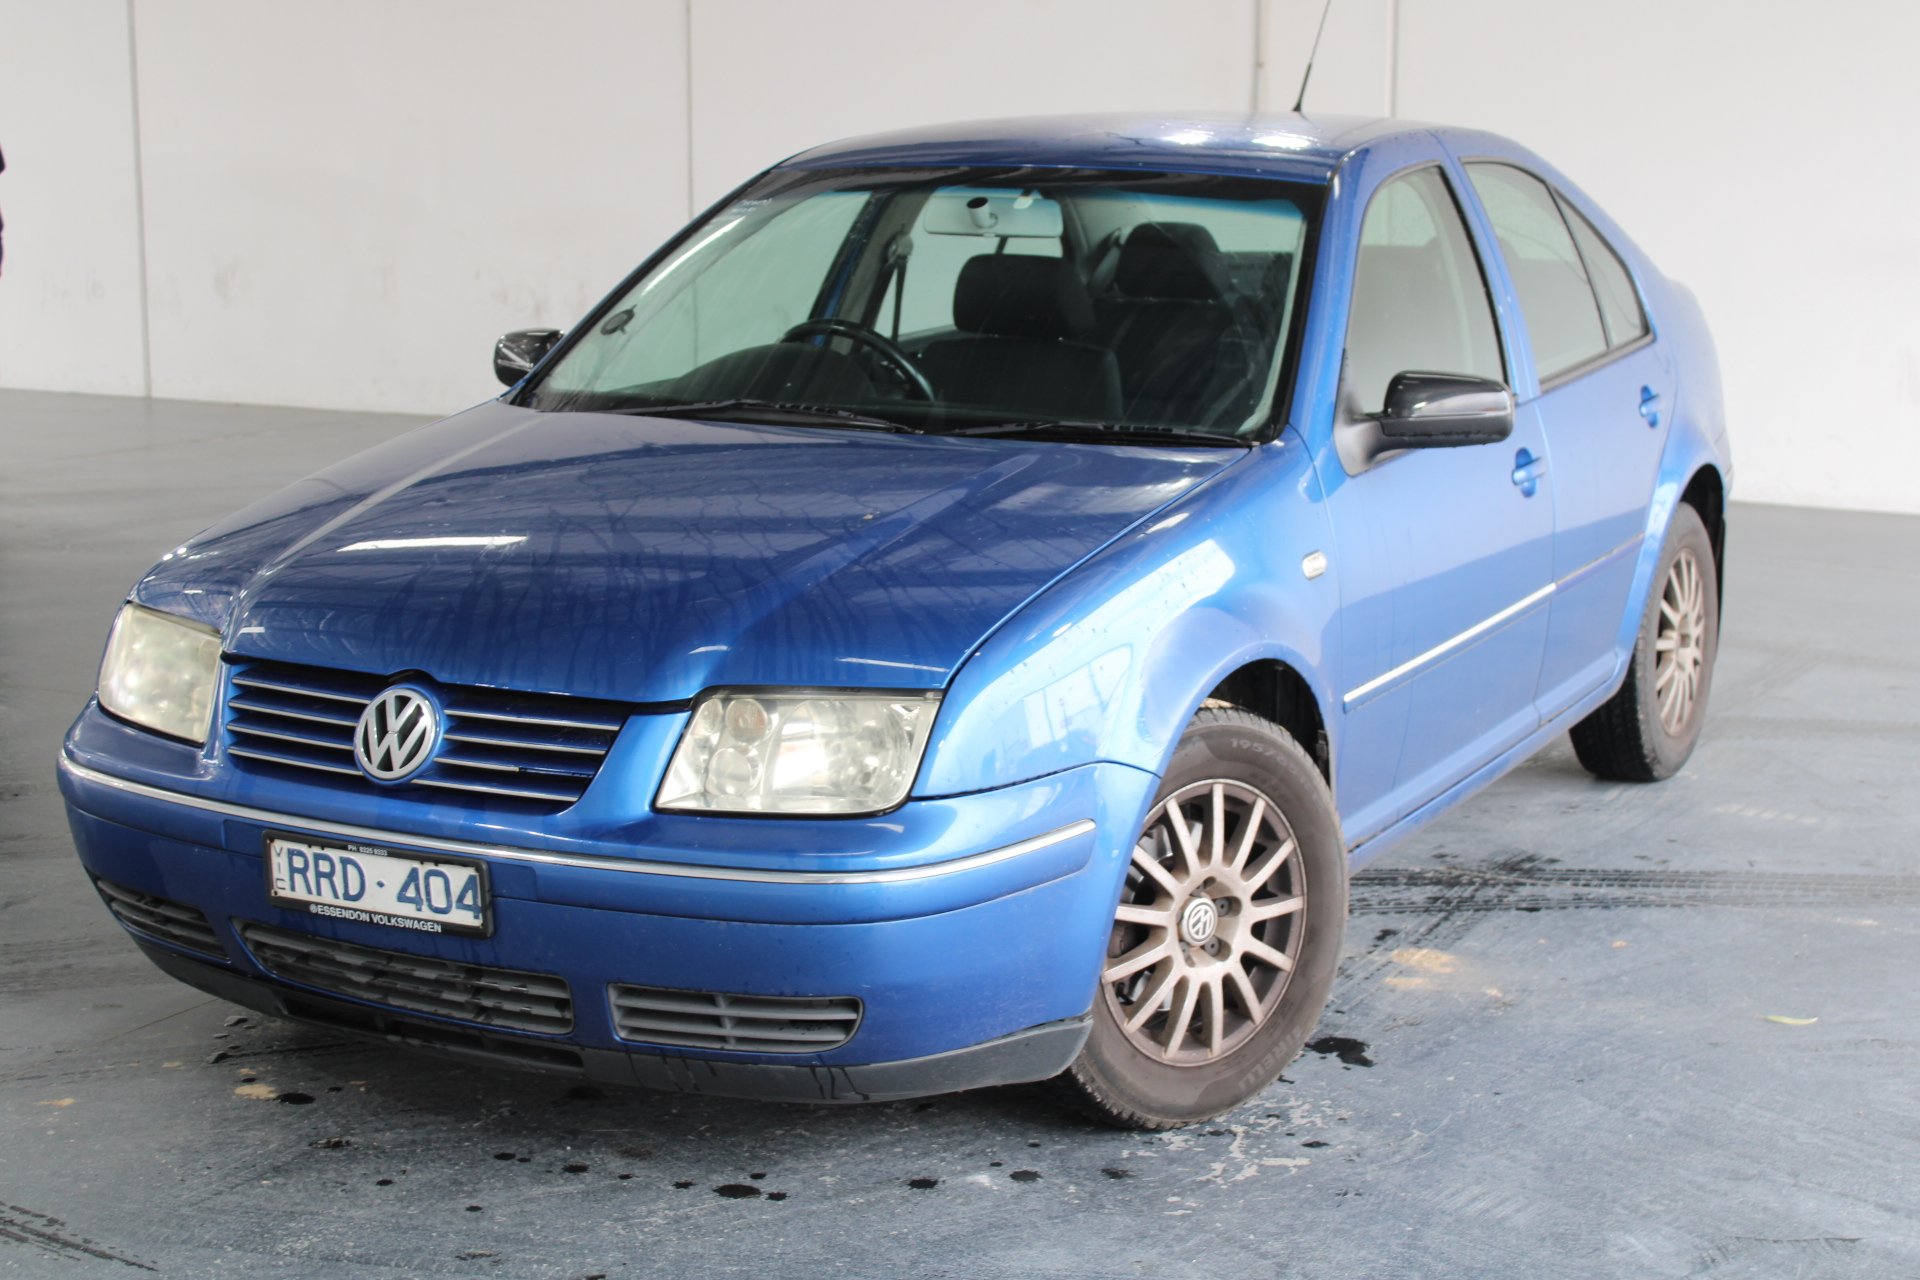 2002 Volkswagen Bora 2.0 1J Manual Sedan